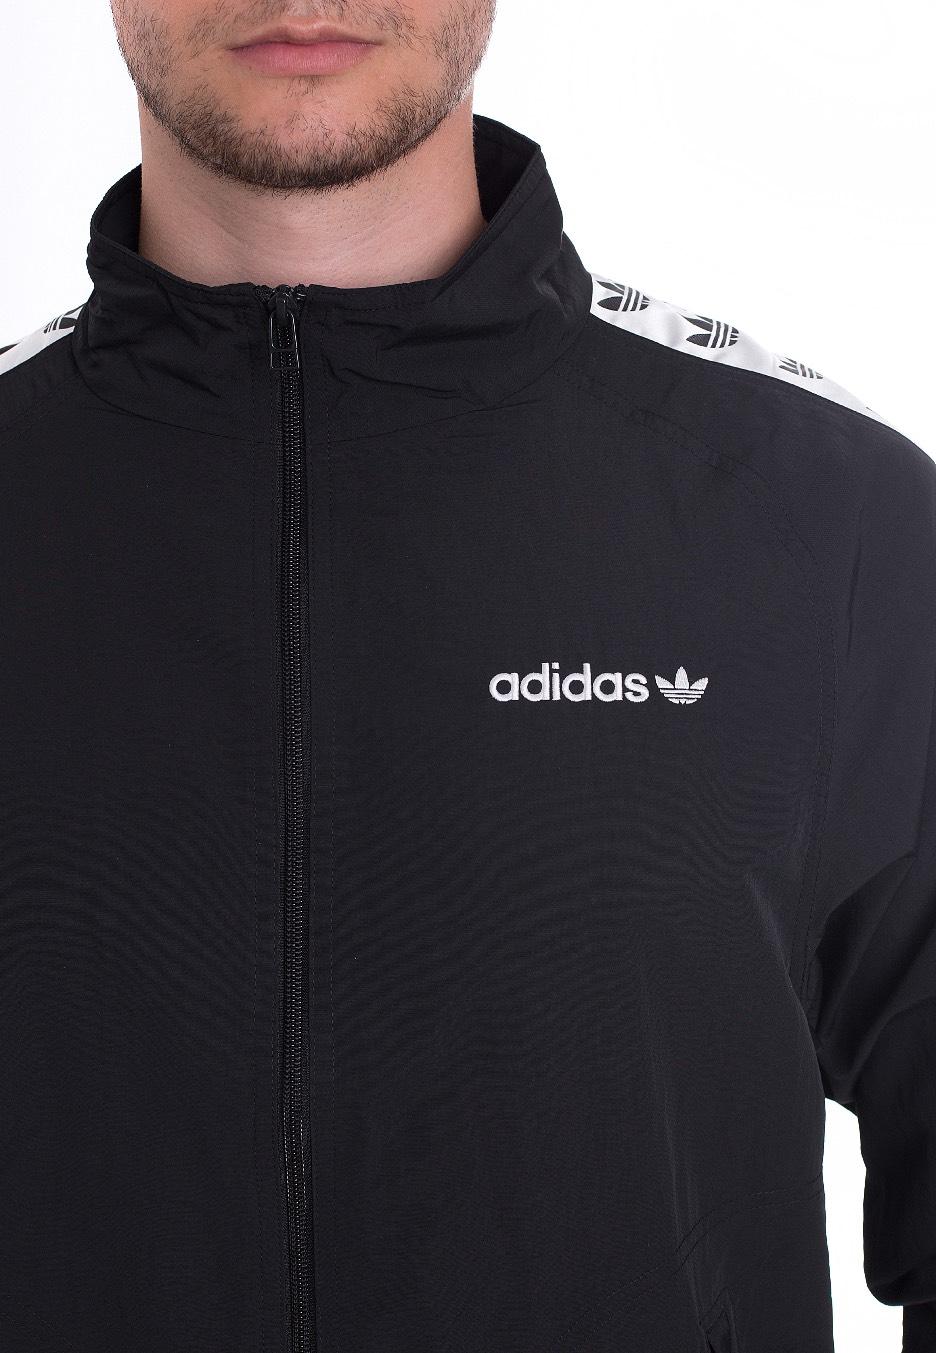 Di Giacca Blackwhite Tnt Adidas Streetwear Wind Tape Negozio 4xIIYqfw